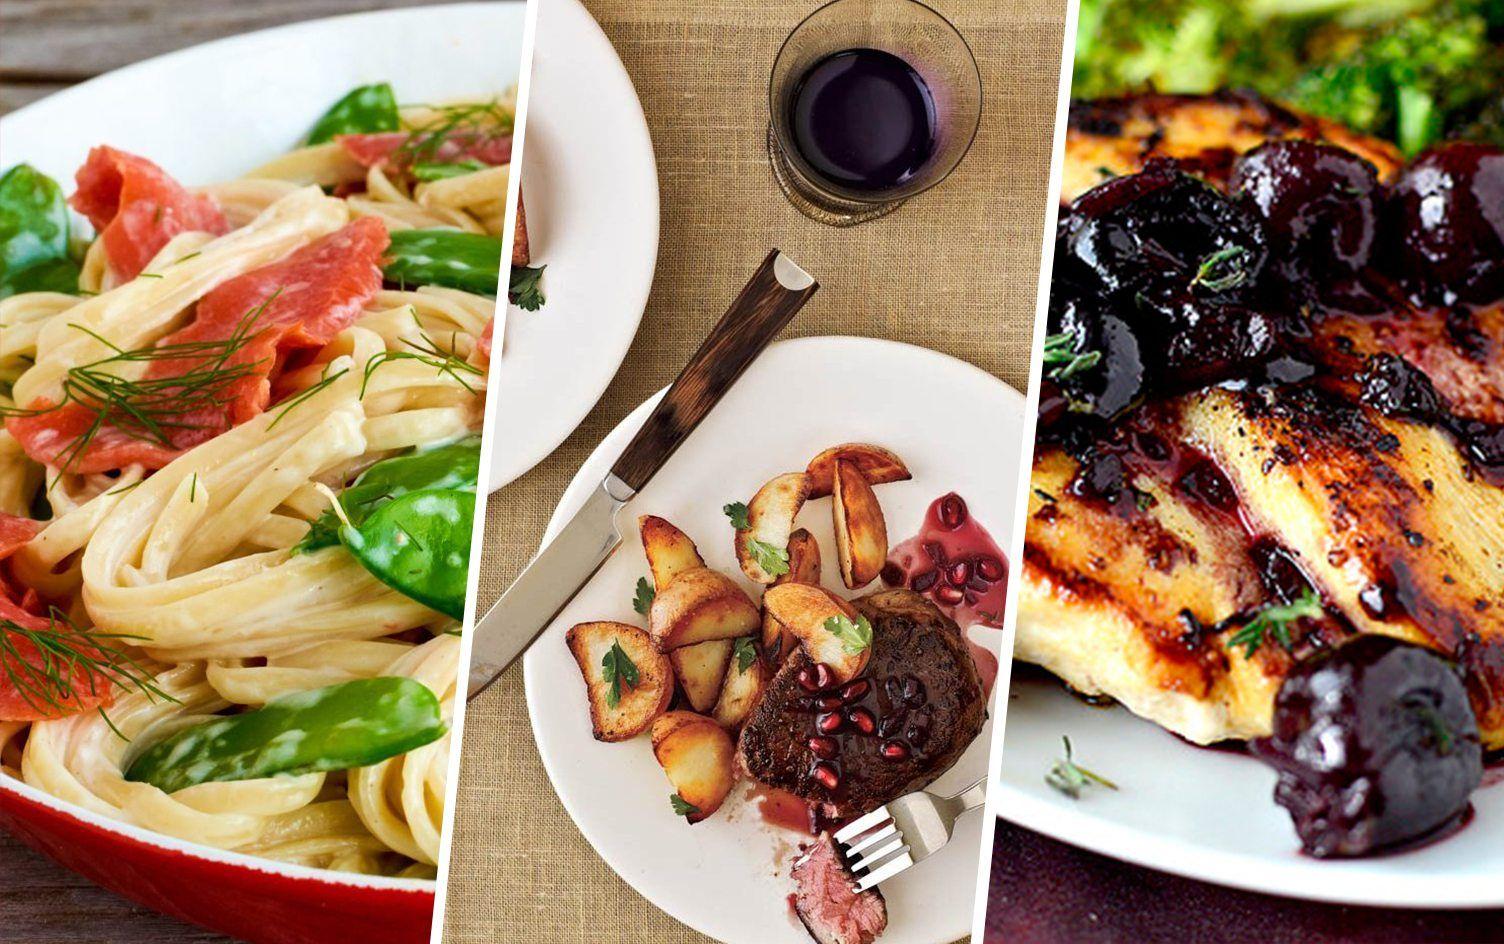 Romantic valentines meals at home - 8 Romantic Meals Under 450 Calories